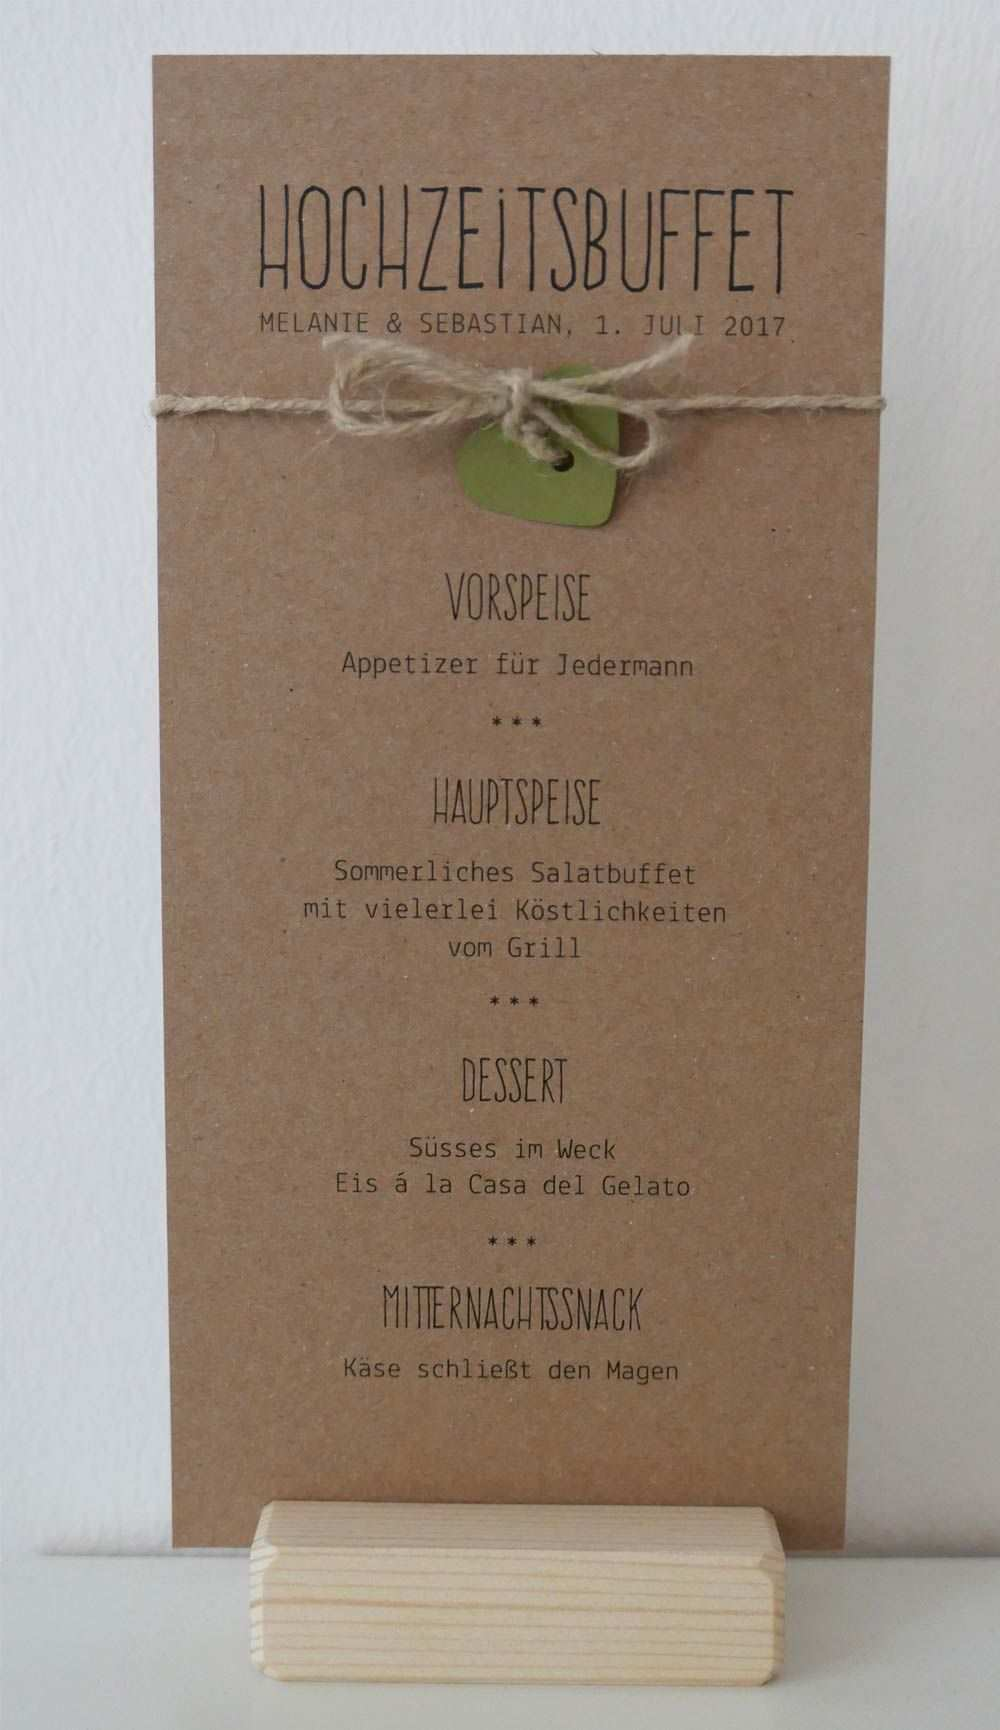 Menukarte Auf Kraftpapier Gedruckt Serie Paulina Wedding Menu On Kraft Paper Hochzeit Menu Menukarten Hochzeit Karte Hochzeit